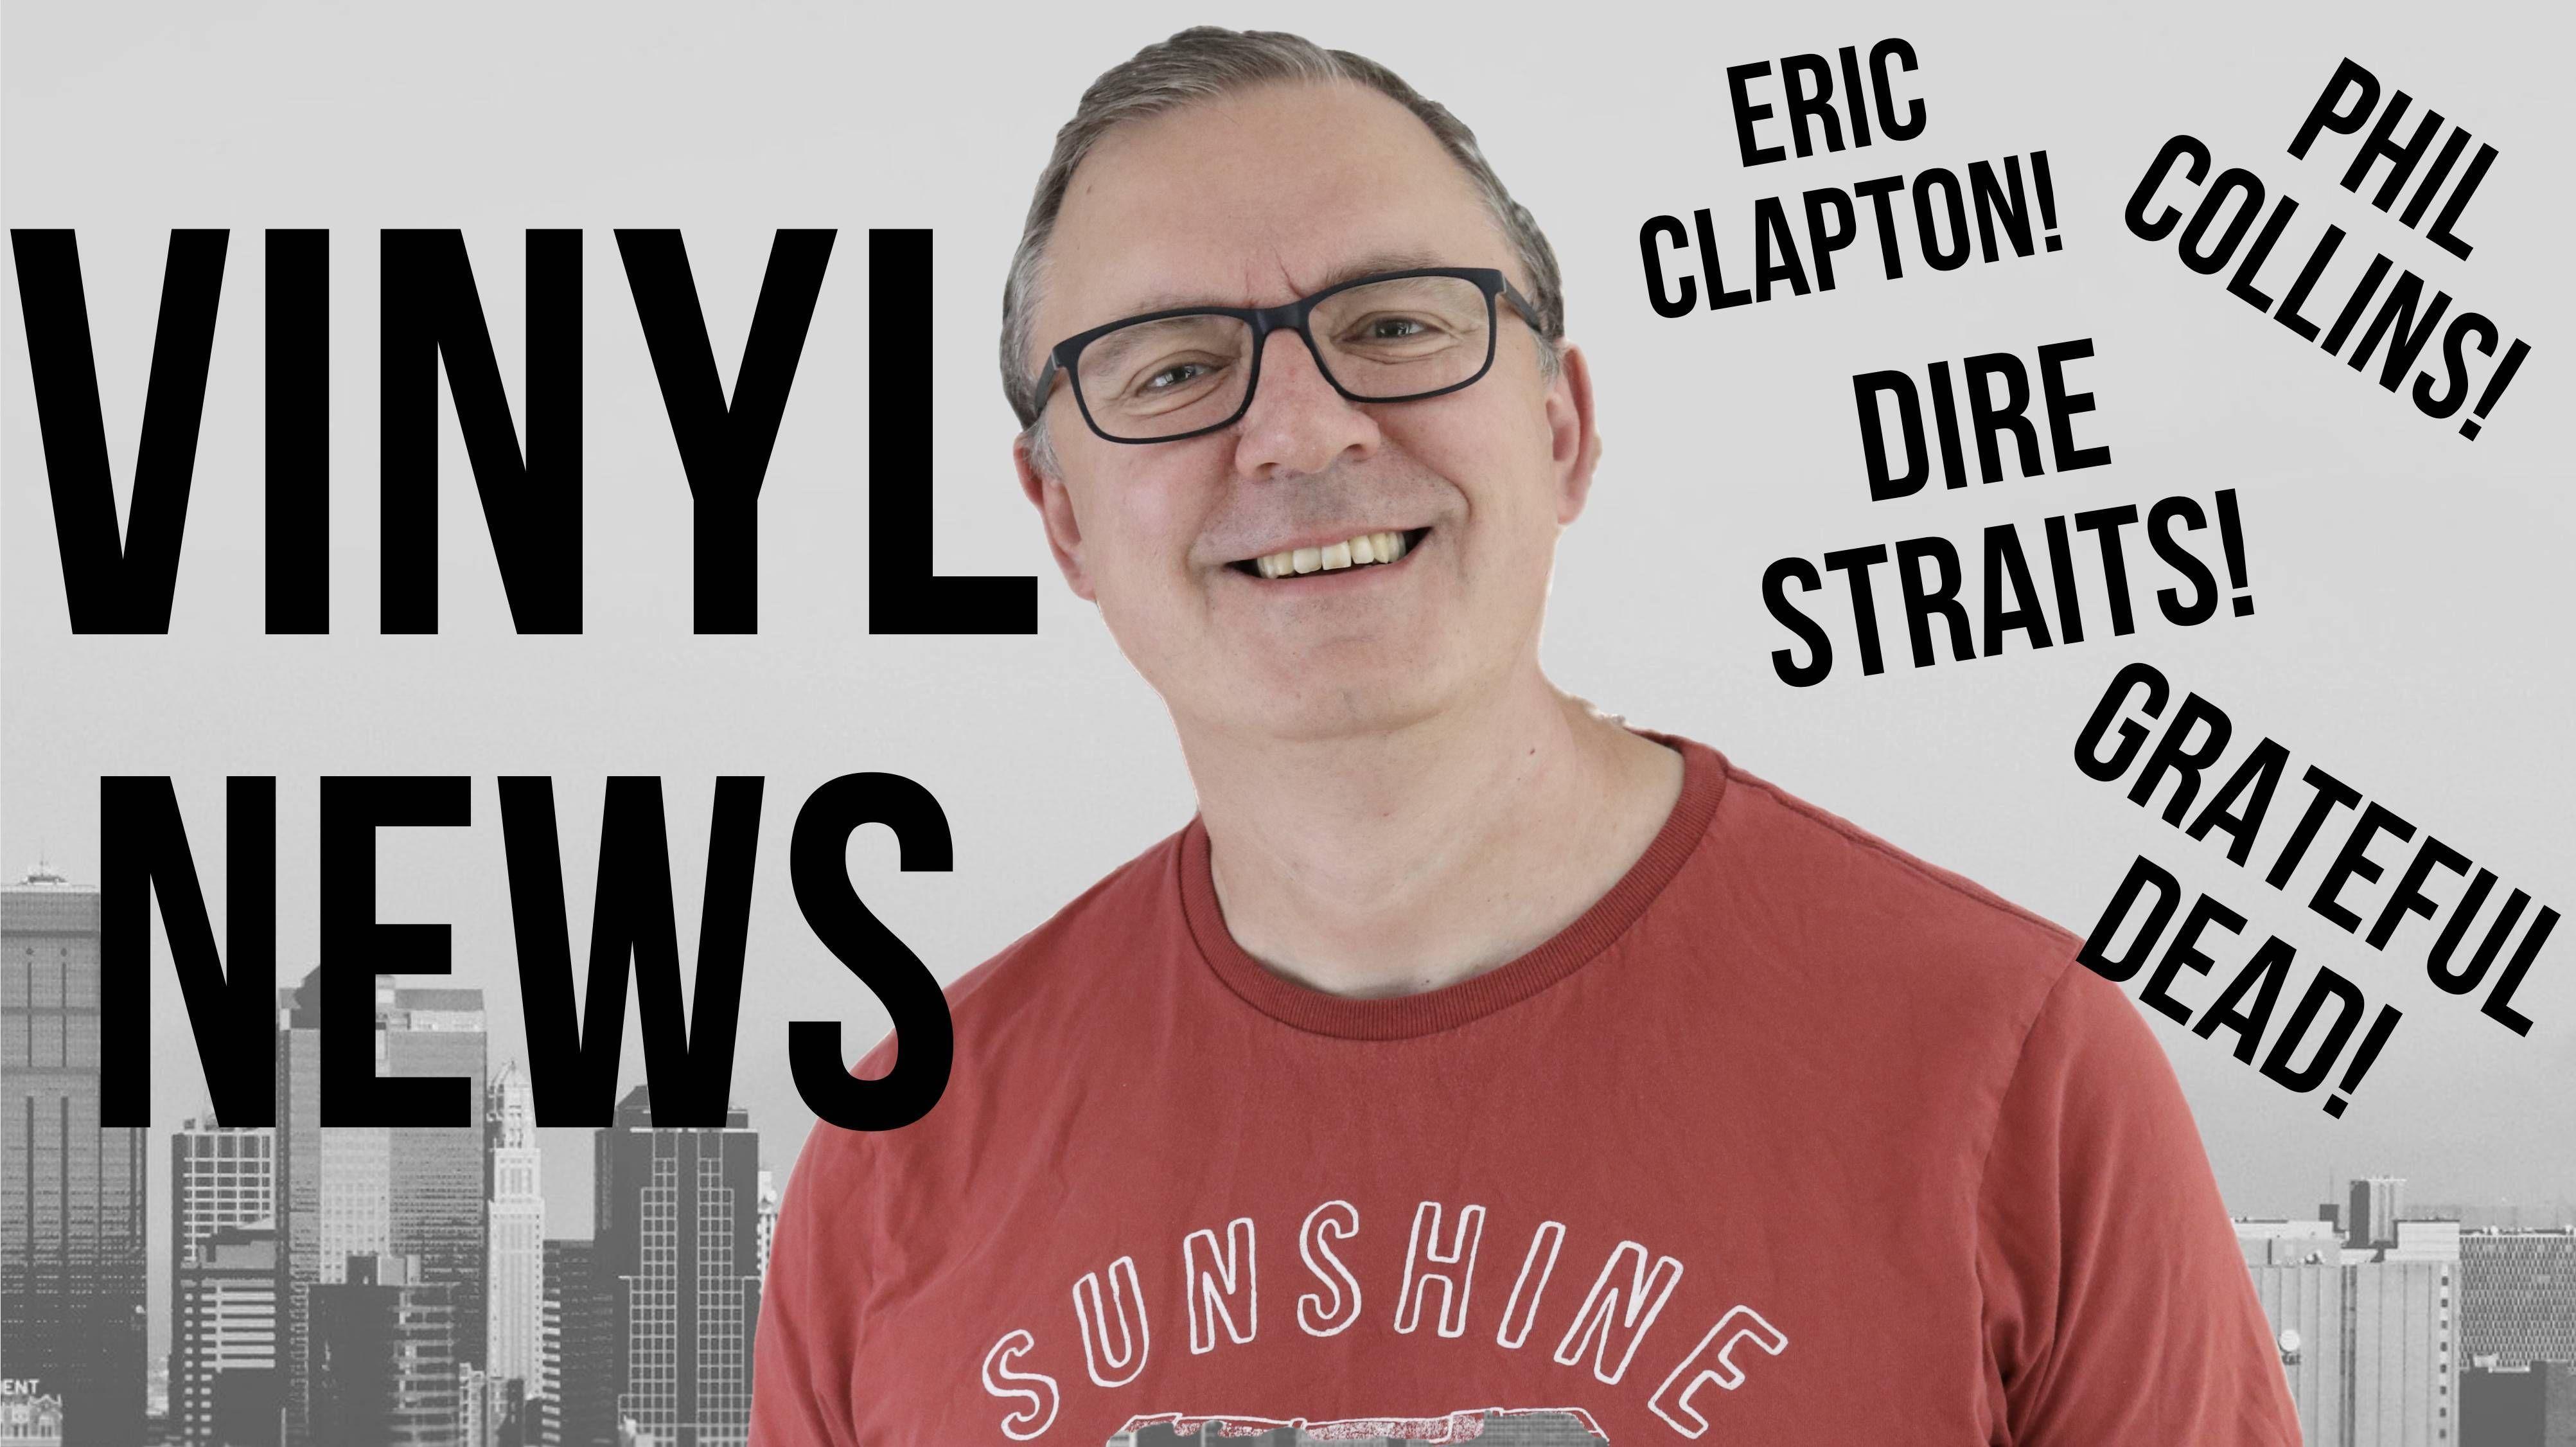 Vinyl News 7 Eric Clapton Dire Straits More In 2020 Dire Straits Eric Clapton Youtube News